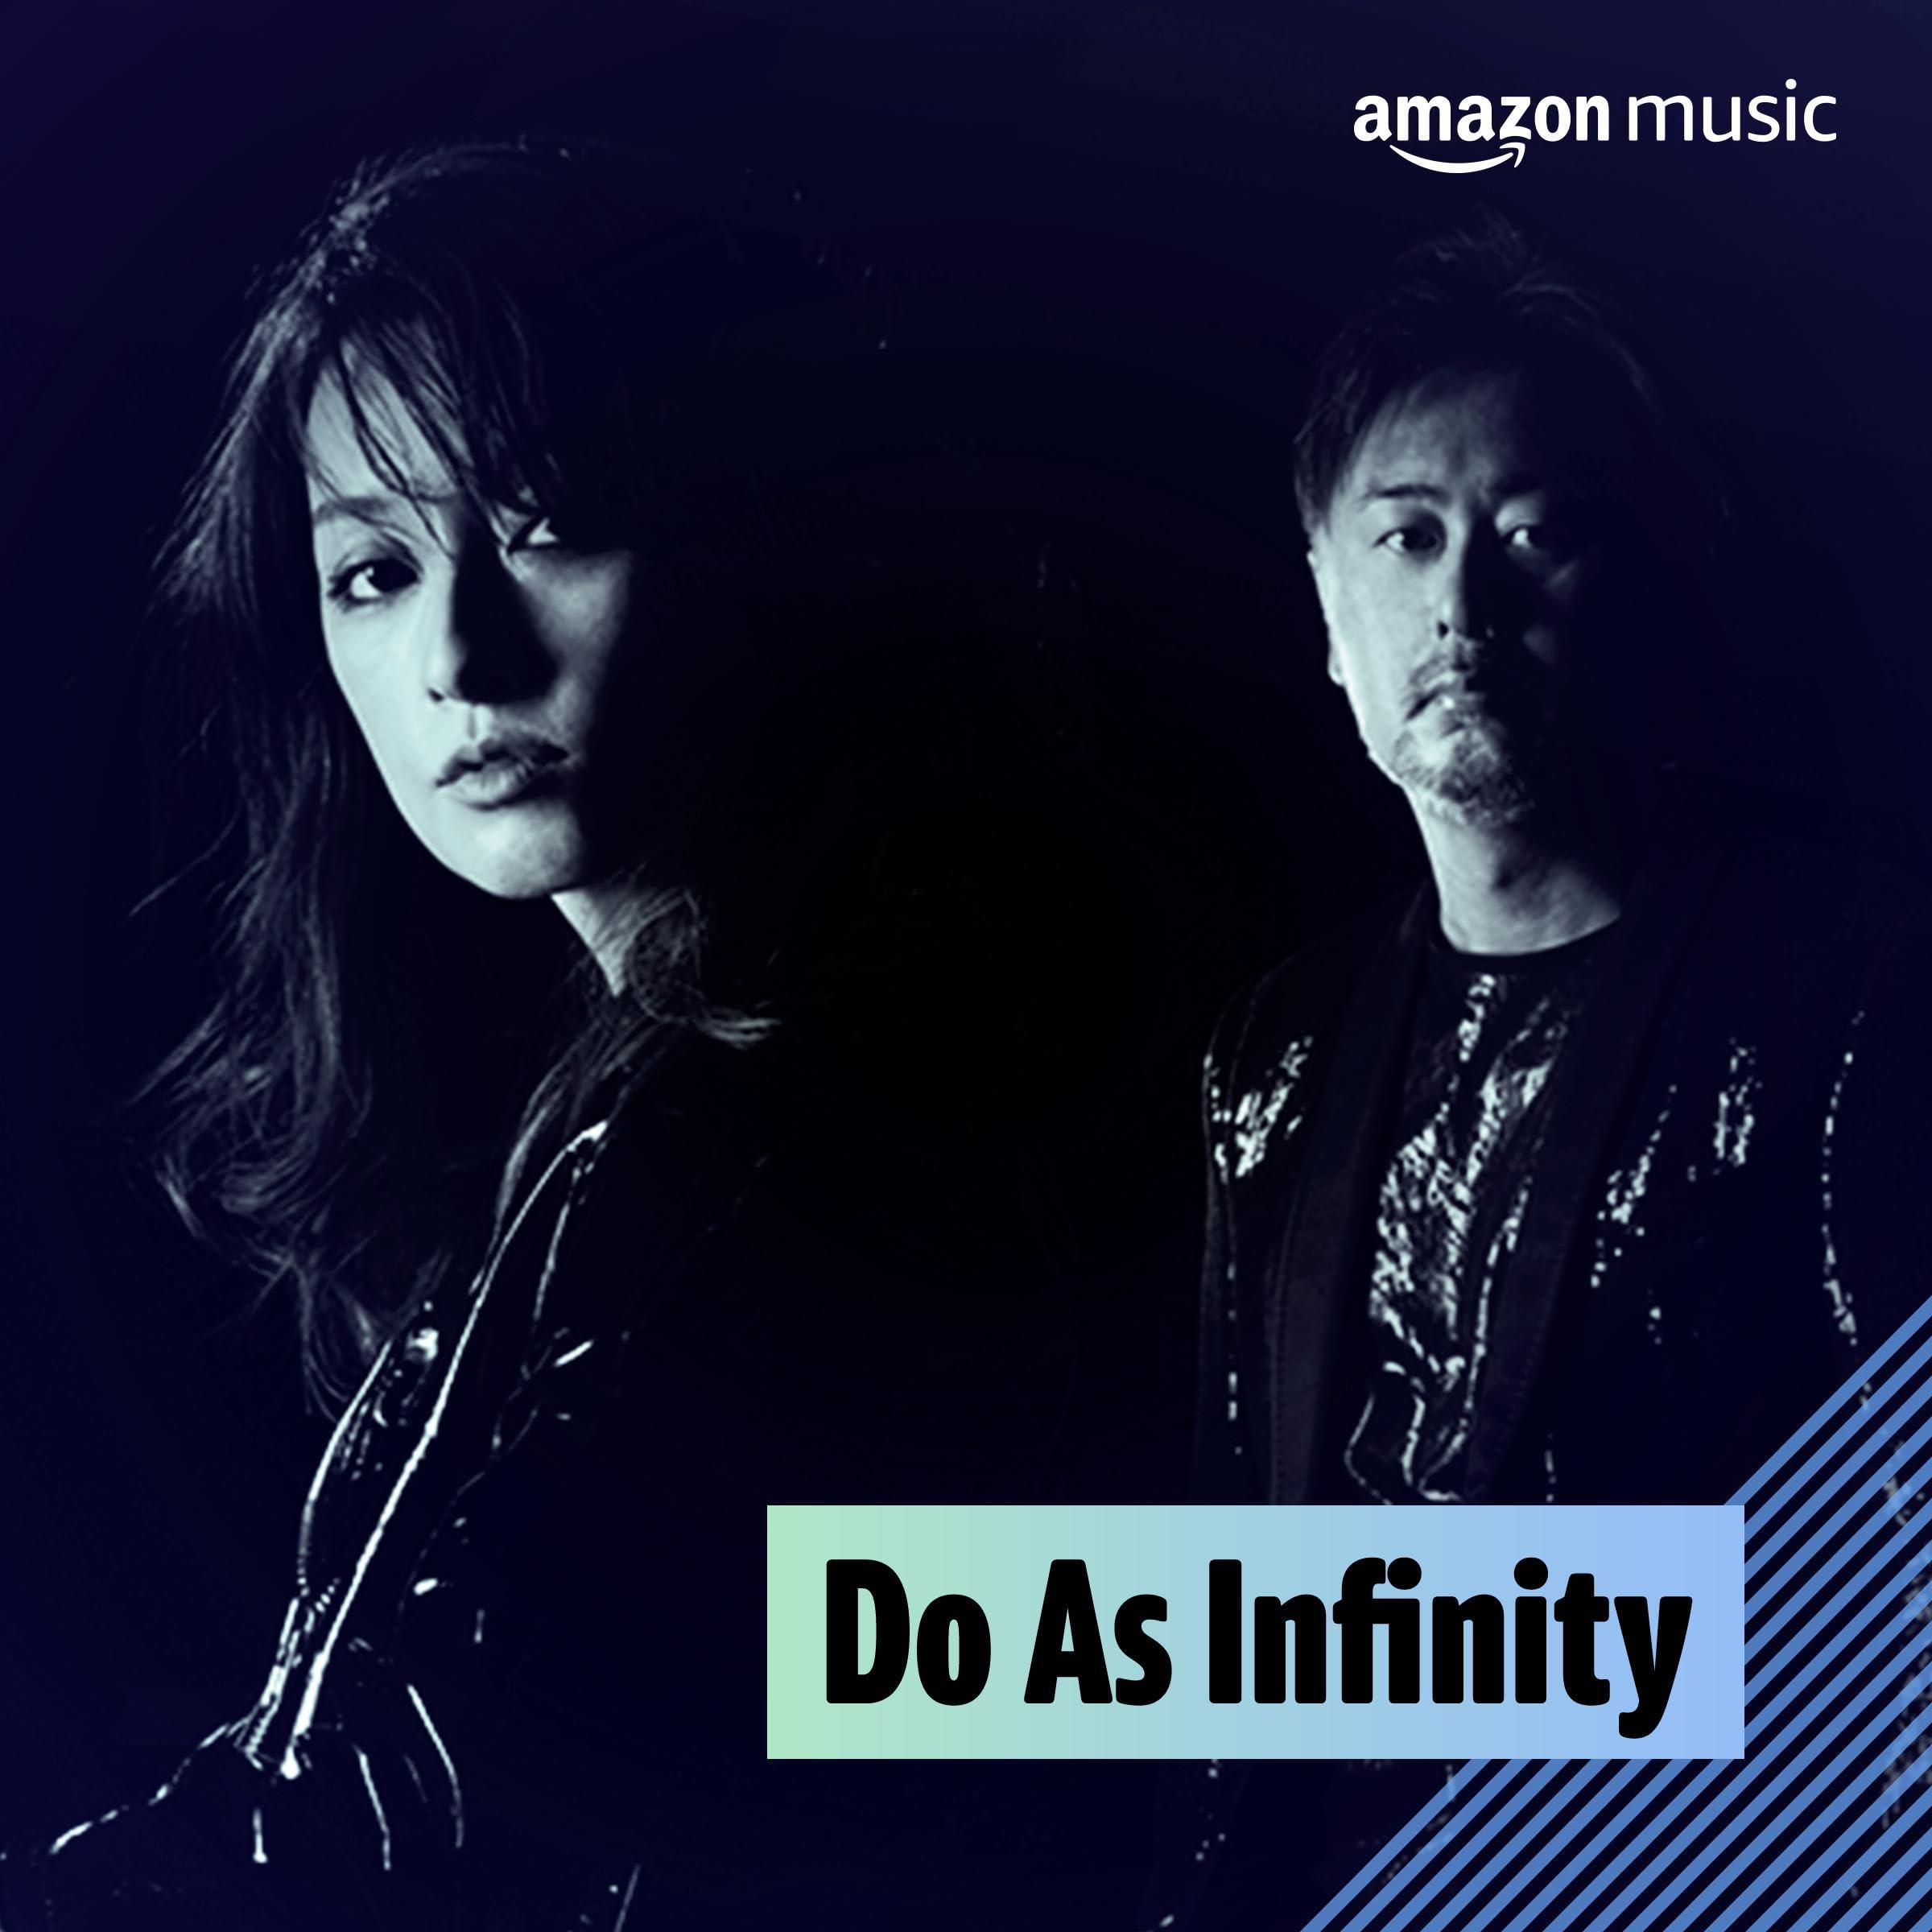 Do As Infinityを聴いているお客様におすすめ